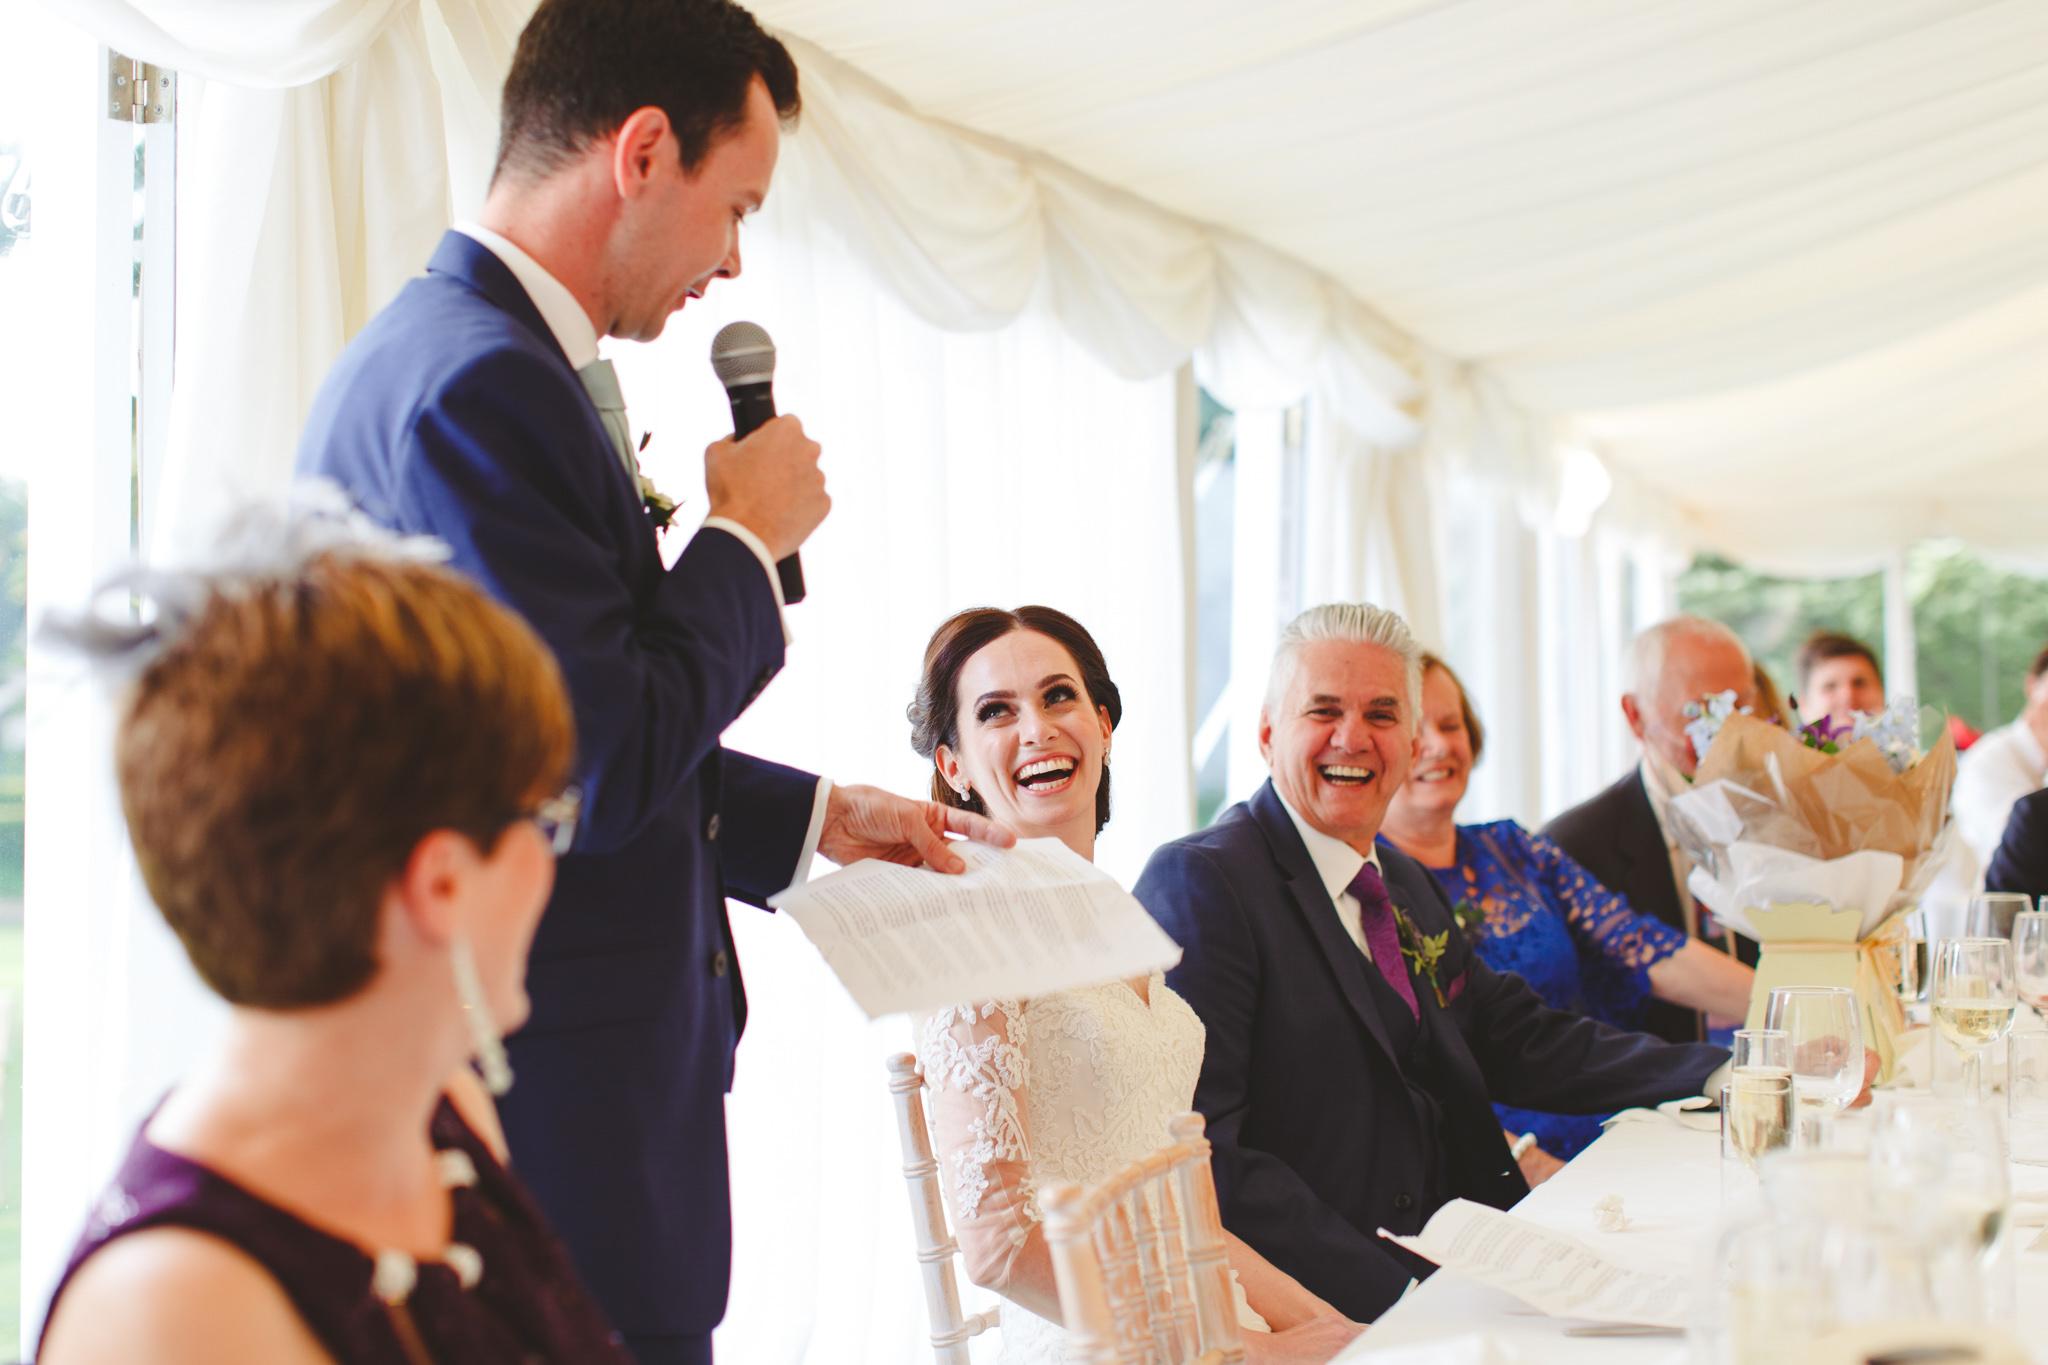 derbyshire-wedding-photographer-videographer-camera-hannah-40.jpg